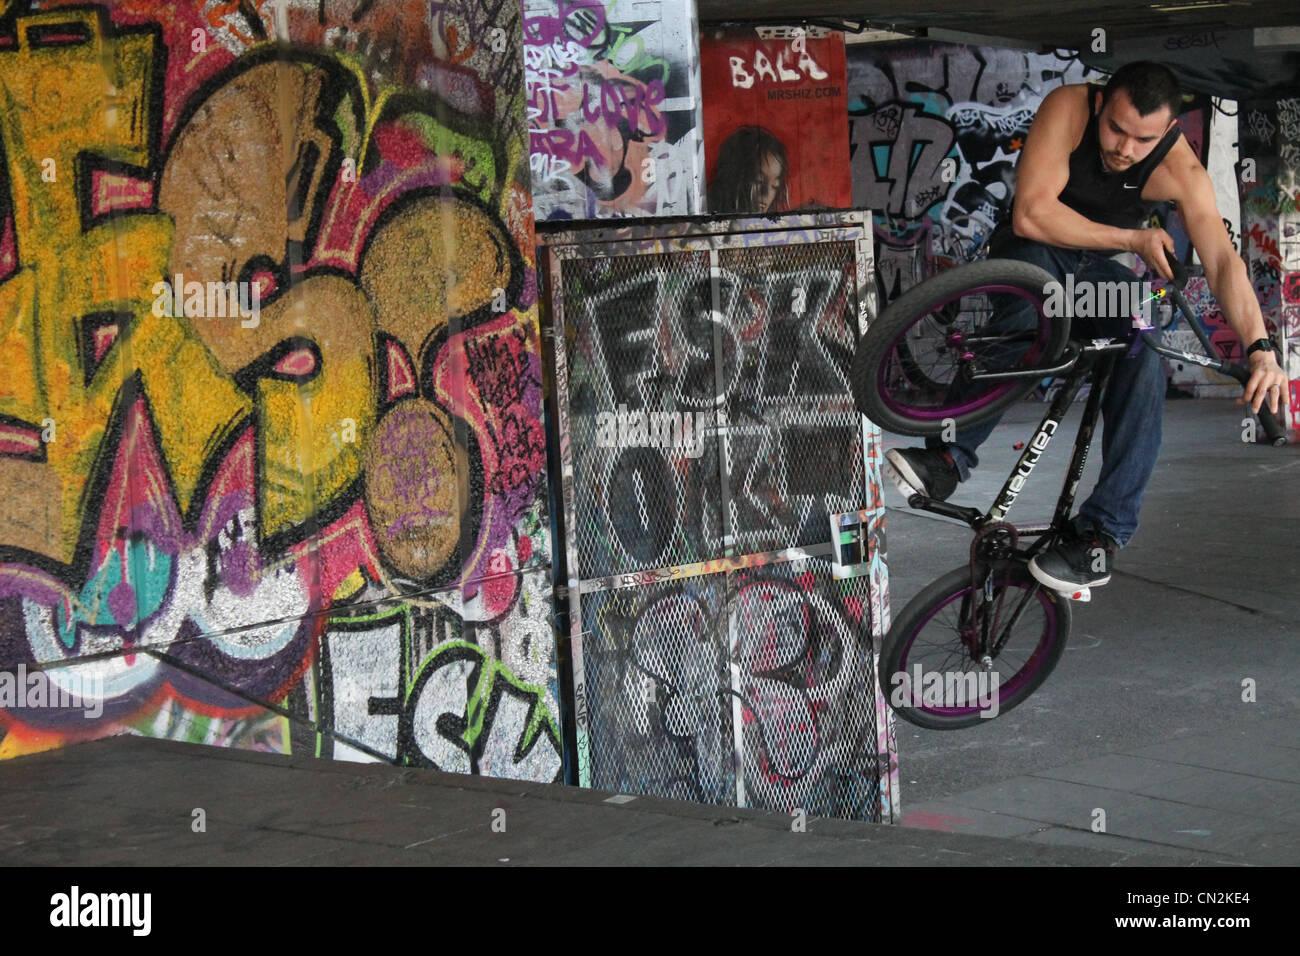 bmx rider, bmx tricks, bmx stunts, bike tricks Stock Photo